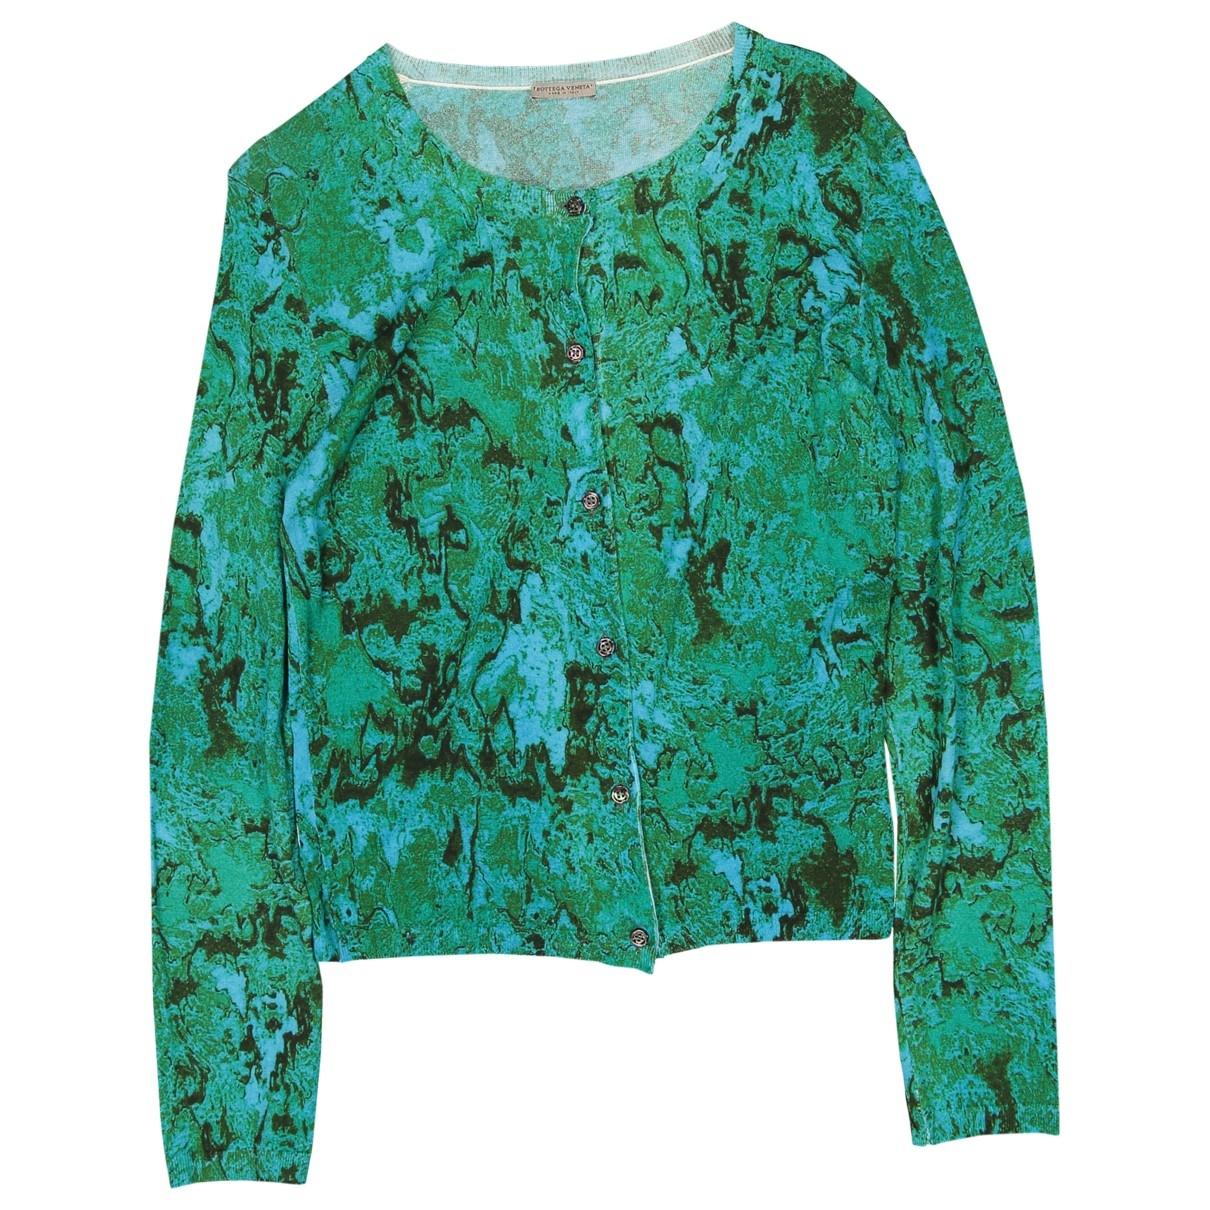 Bottega Veneta \N Green Cashmere Knitwear for Women 40 IT